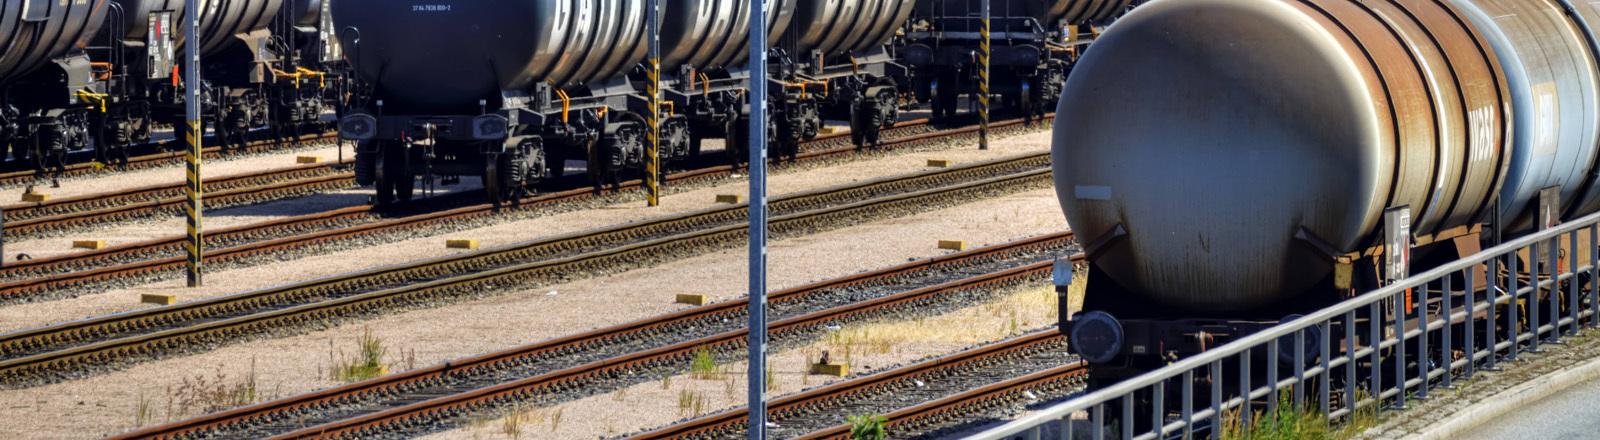 Güterzüge